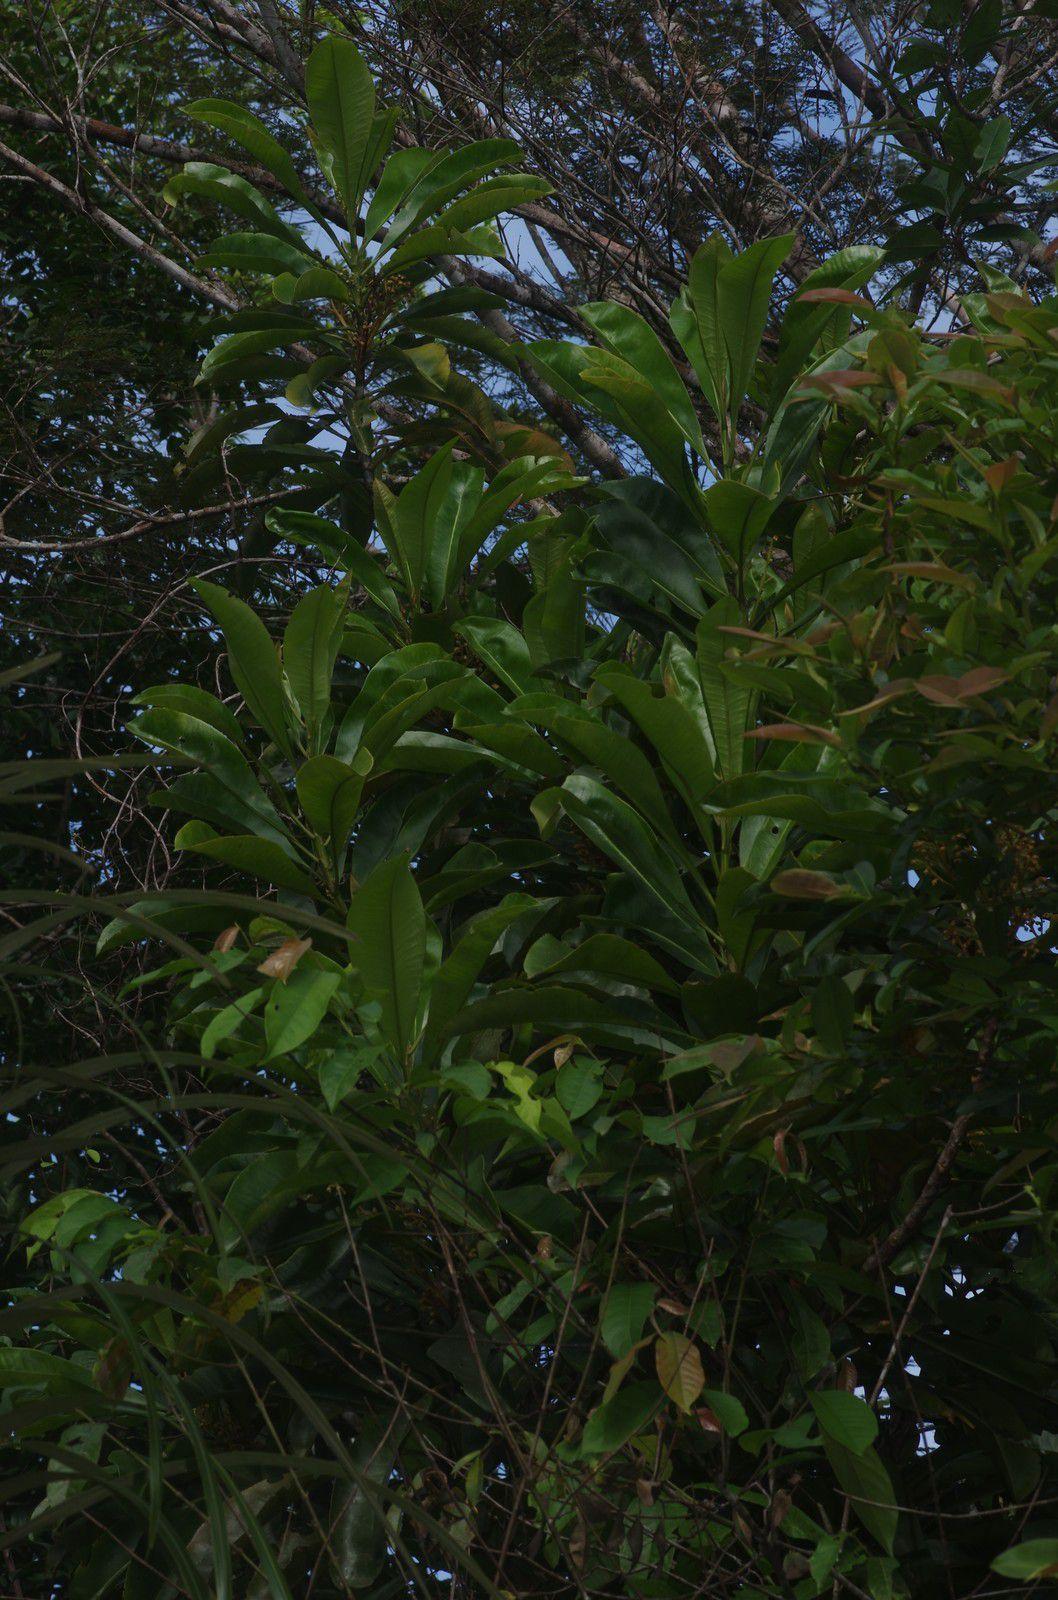 Rhabdodendron amazonicum